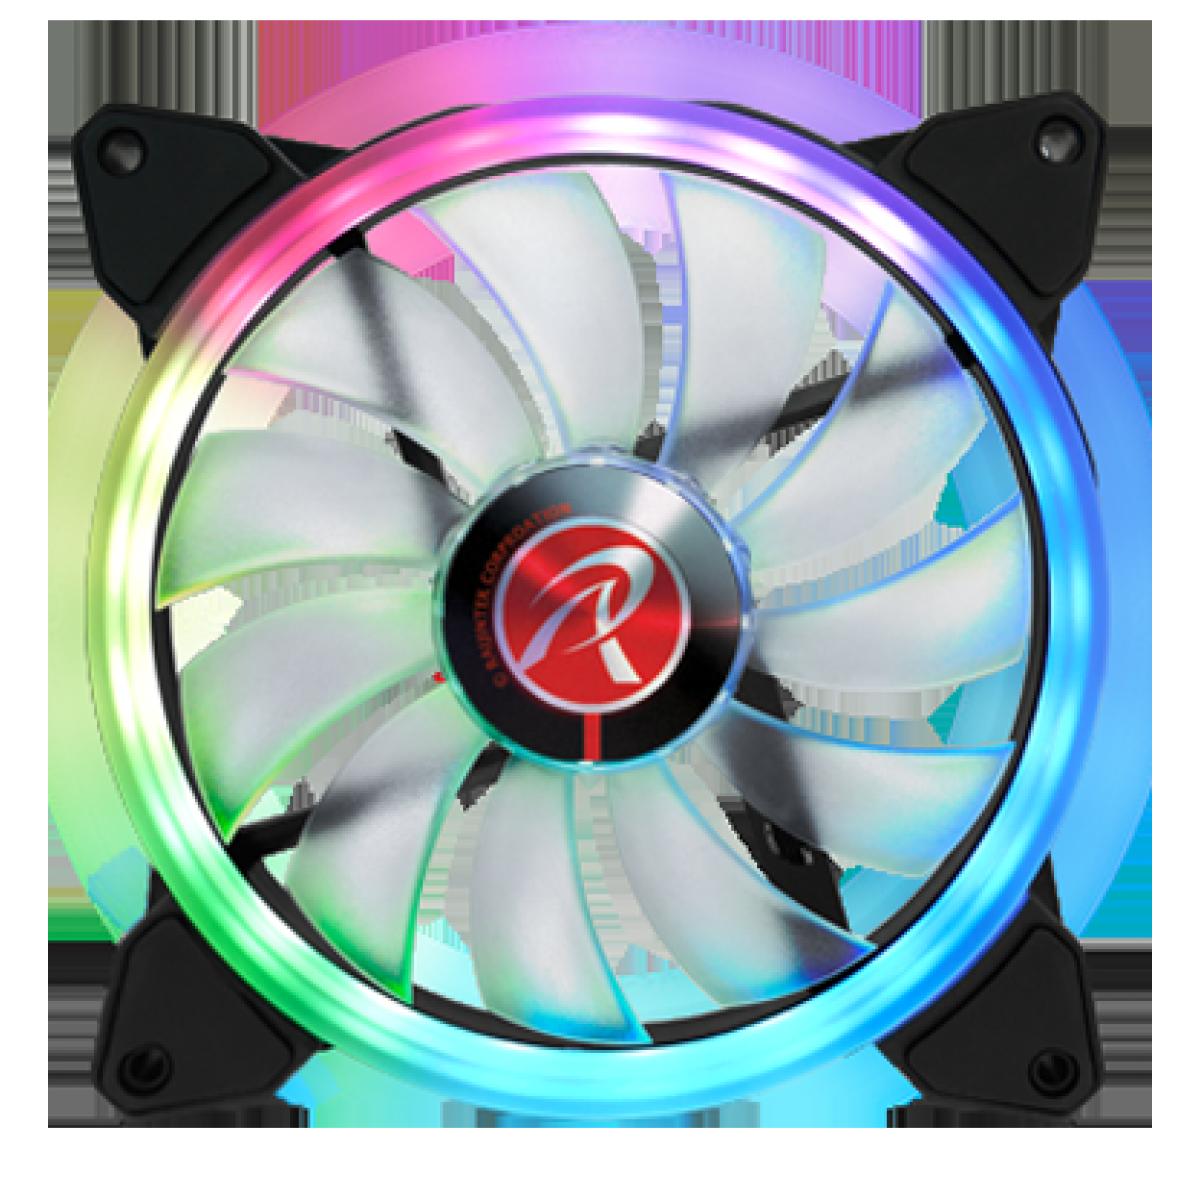 Kit Fan com 2 Unidades Raijintek Iris 14 RBW ADD-2, ARGB, 140mm, 0R40B00114